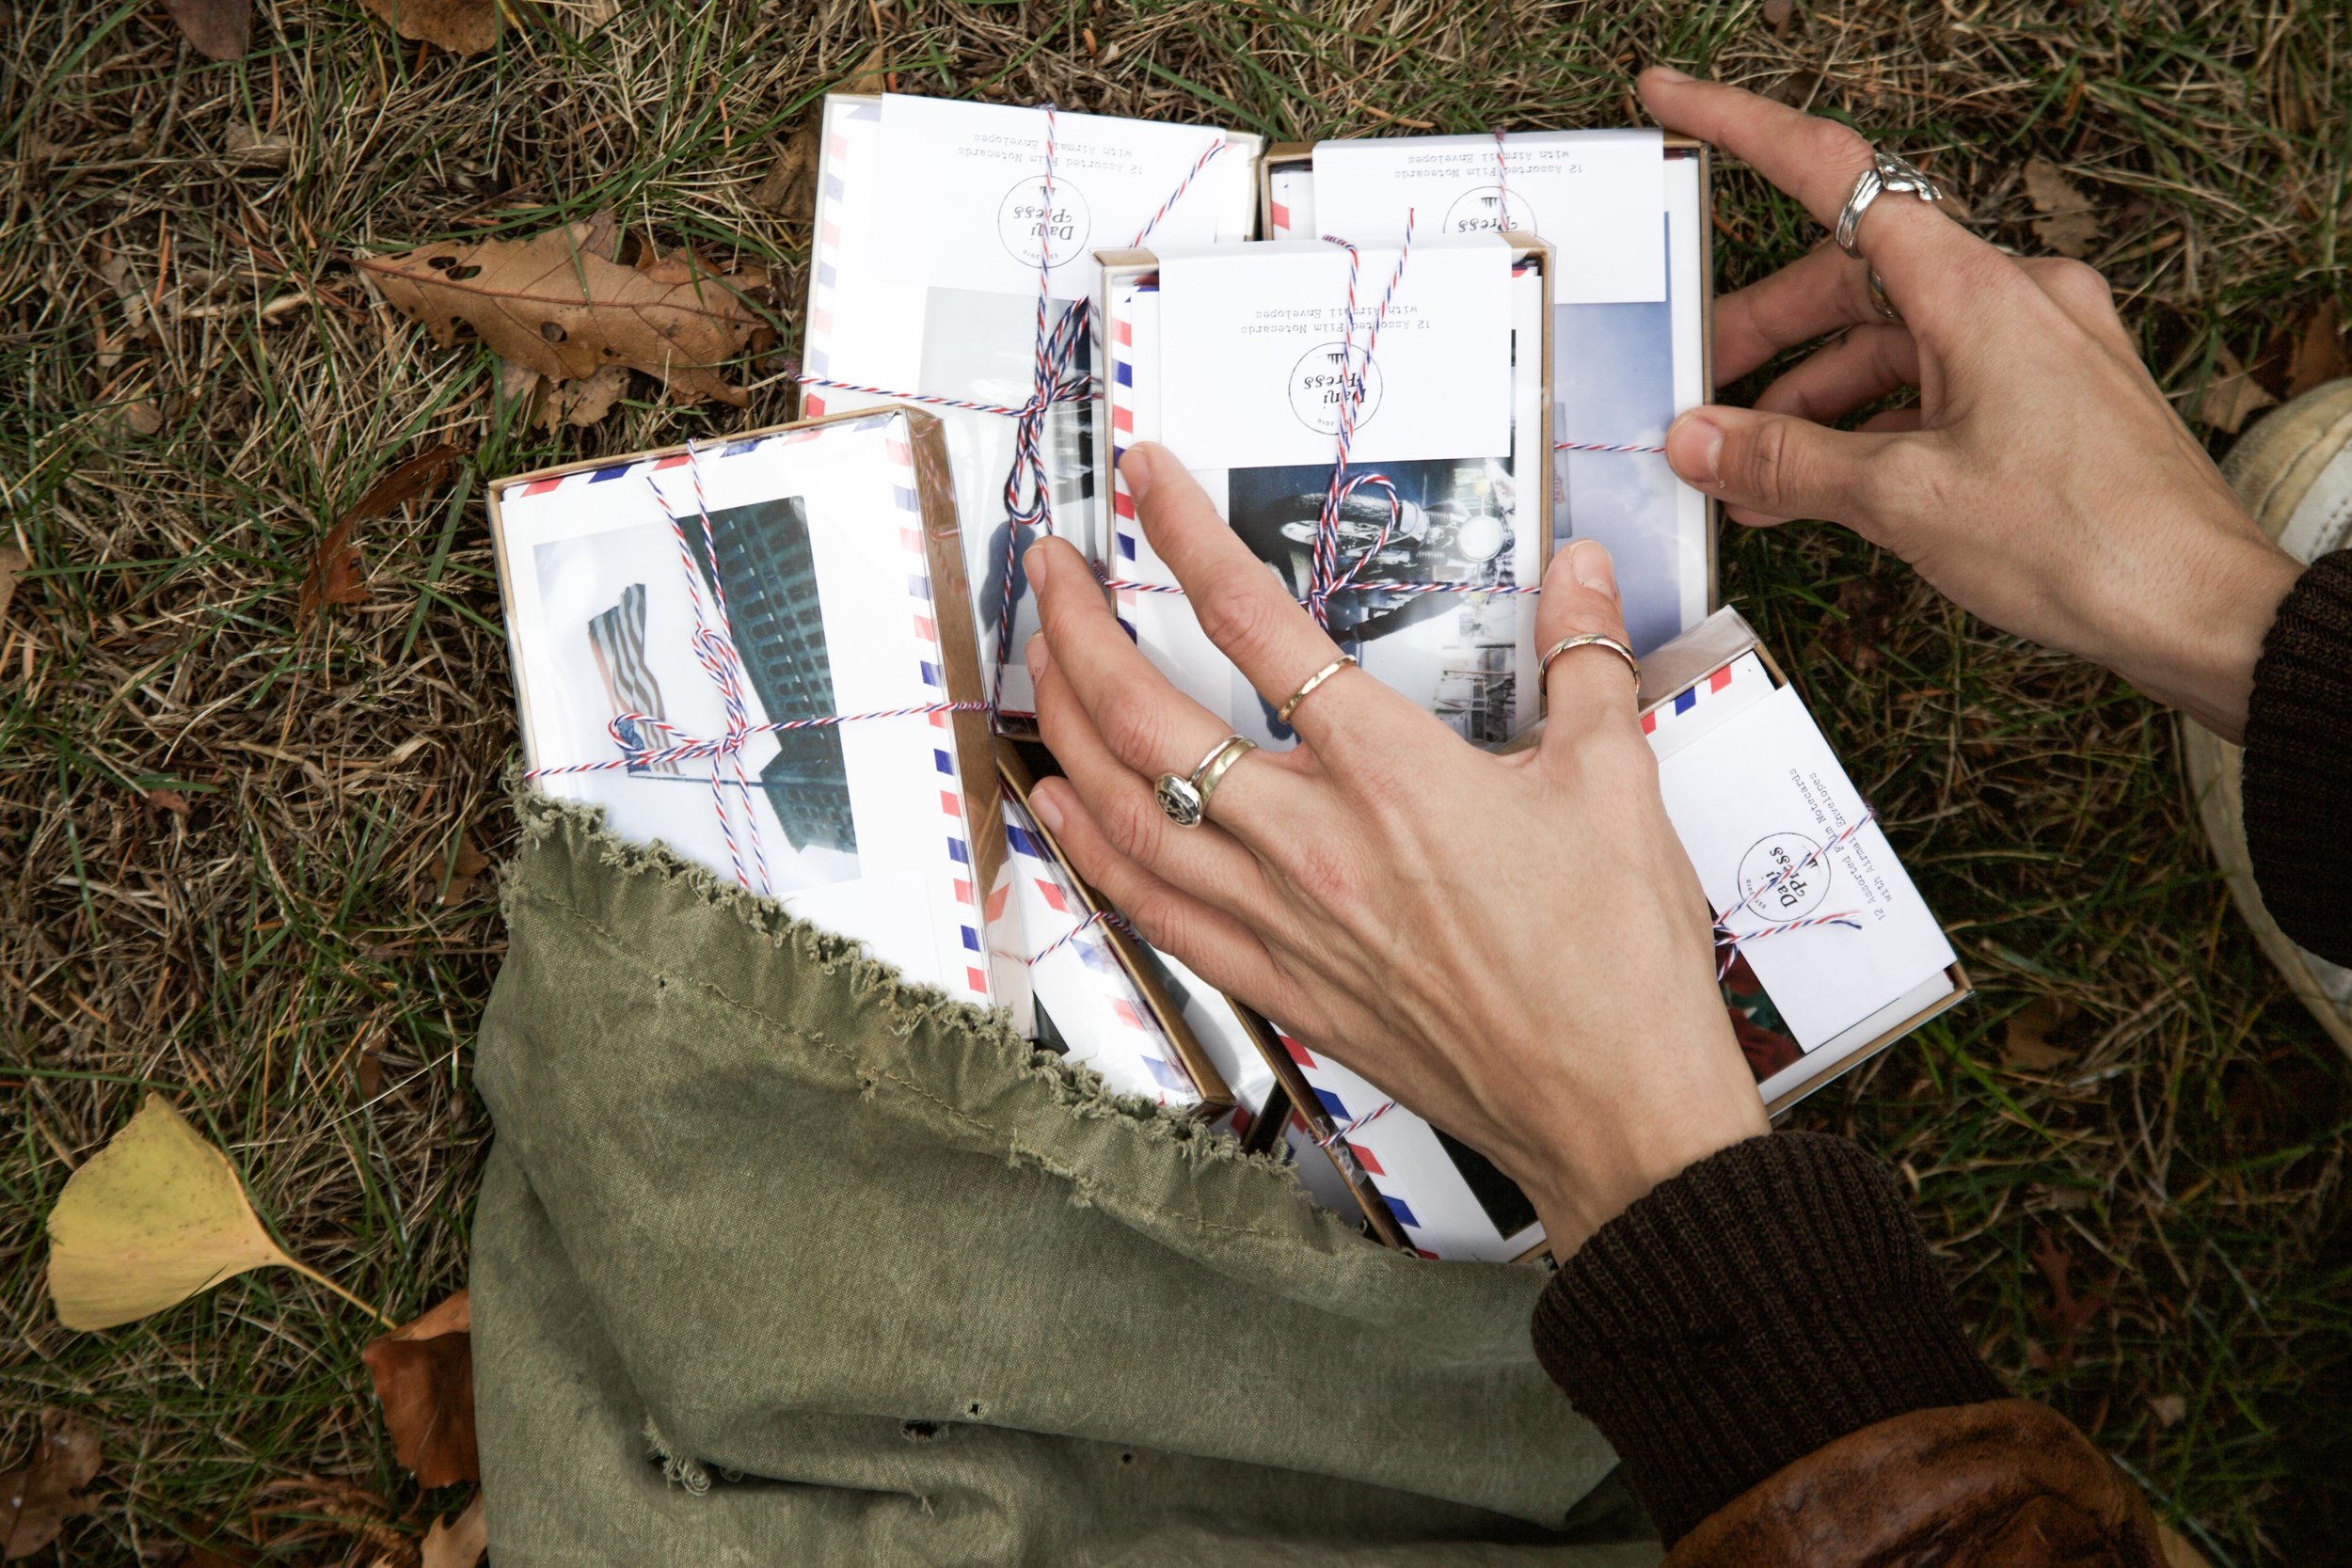 FILM SETS copy 2.jpg